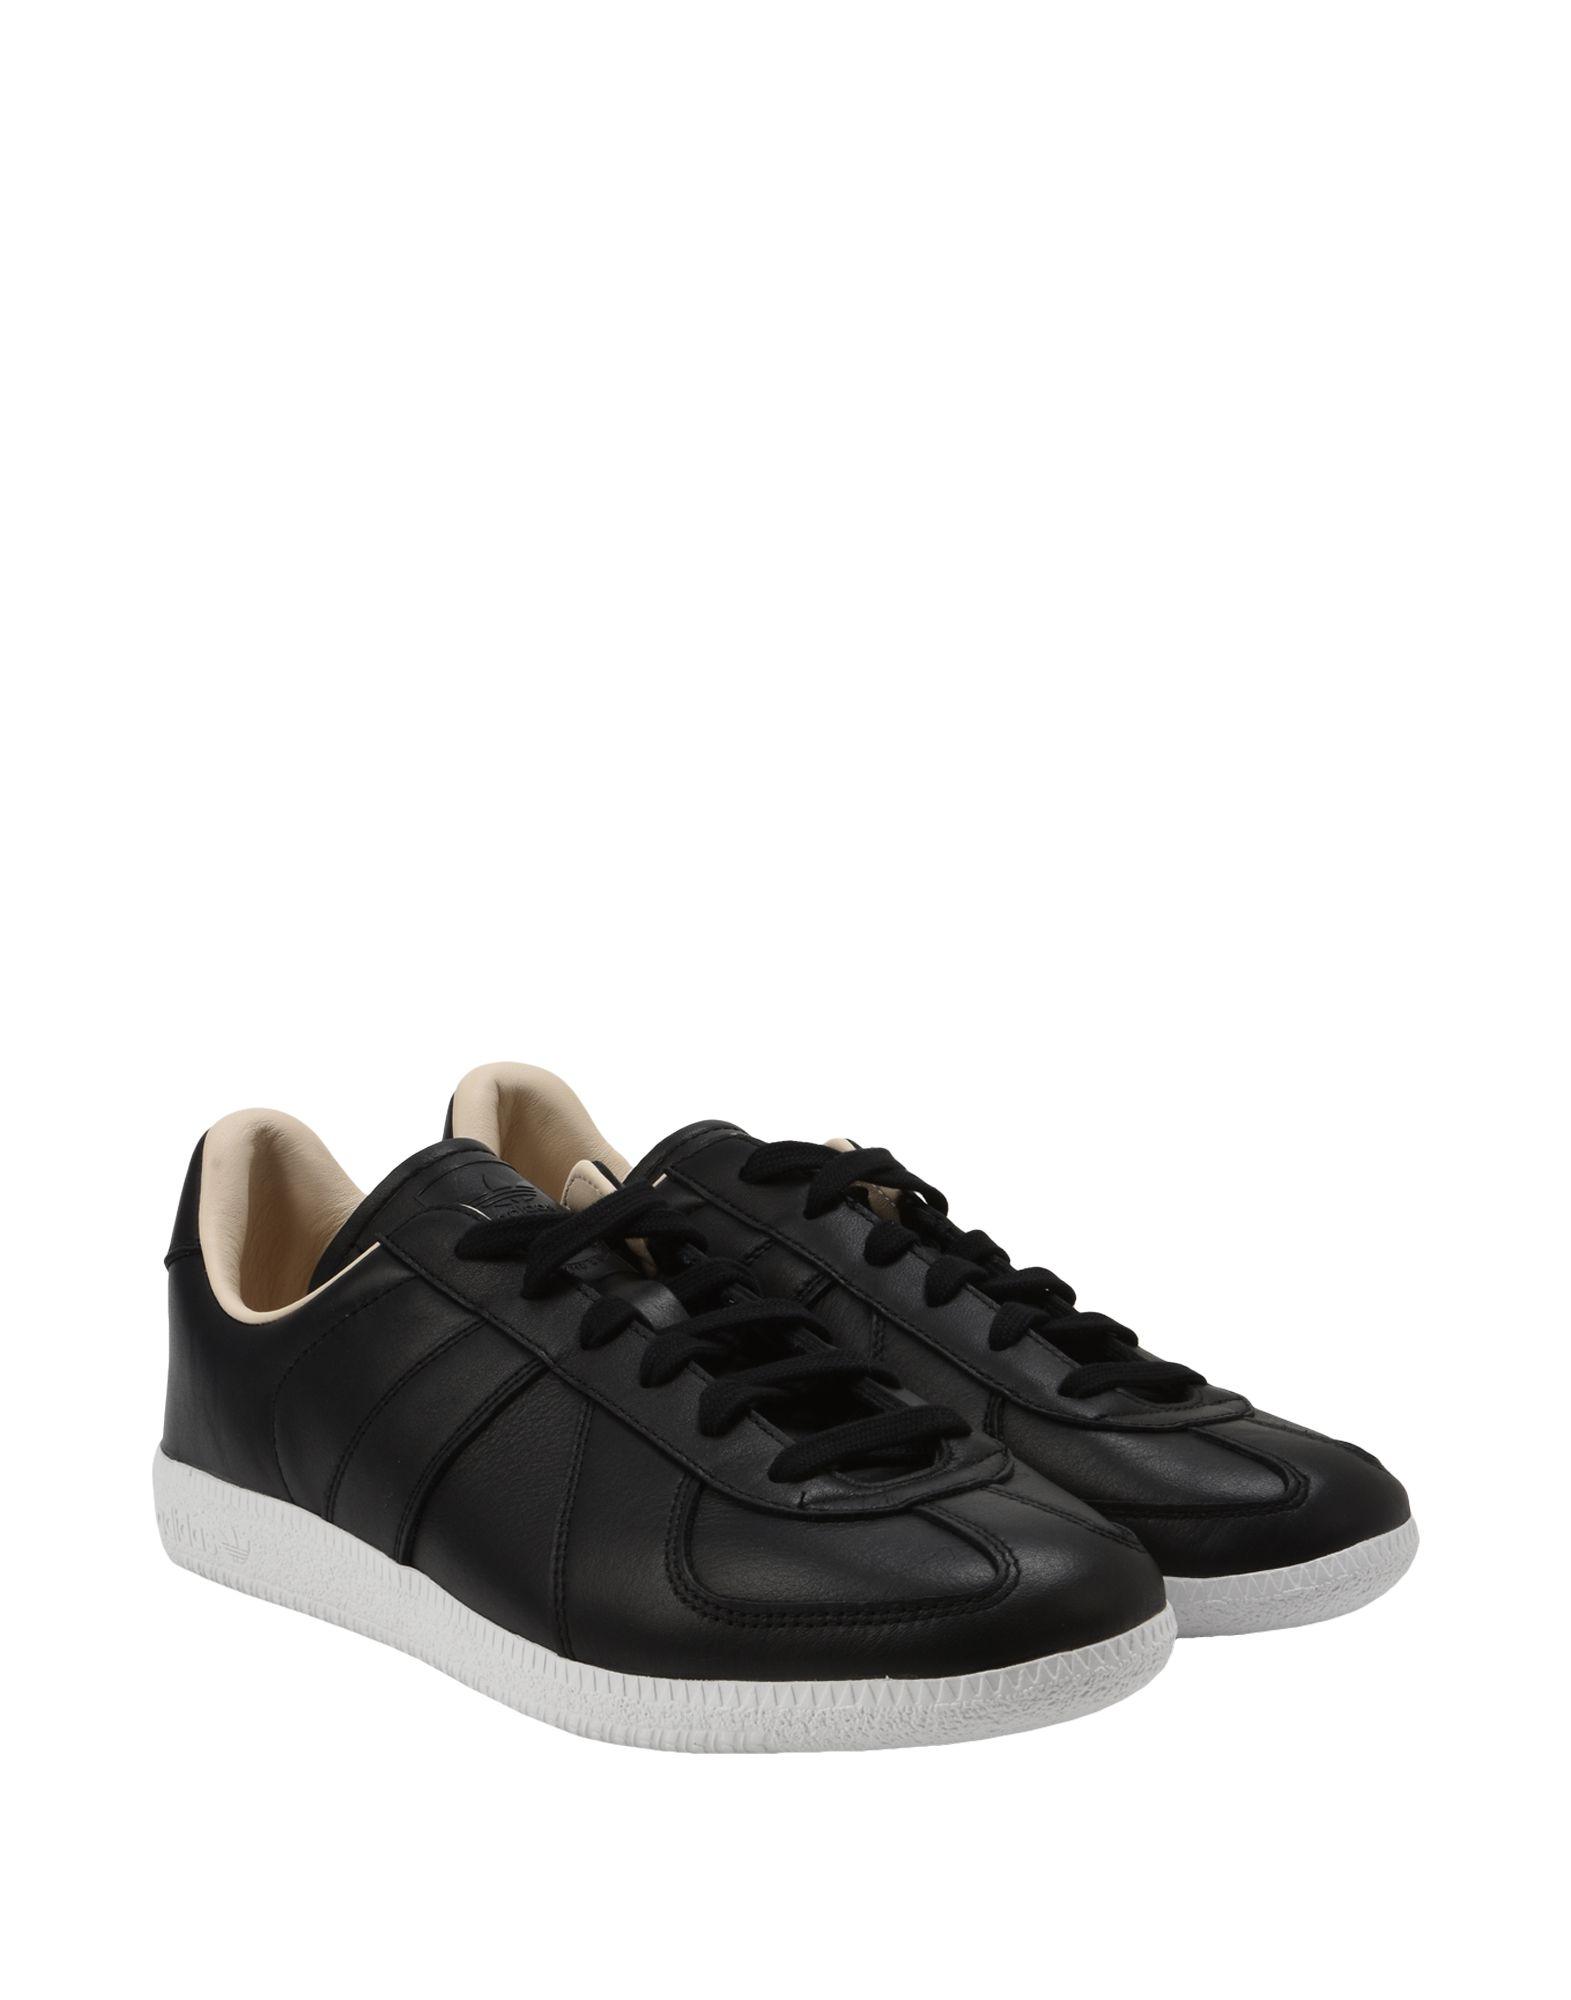 Adidas Originals Schuhe Bw Army  11542274RQ Neue Schuhe Originals 9b9bb6